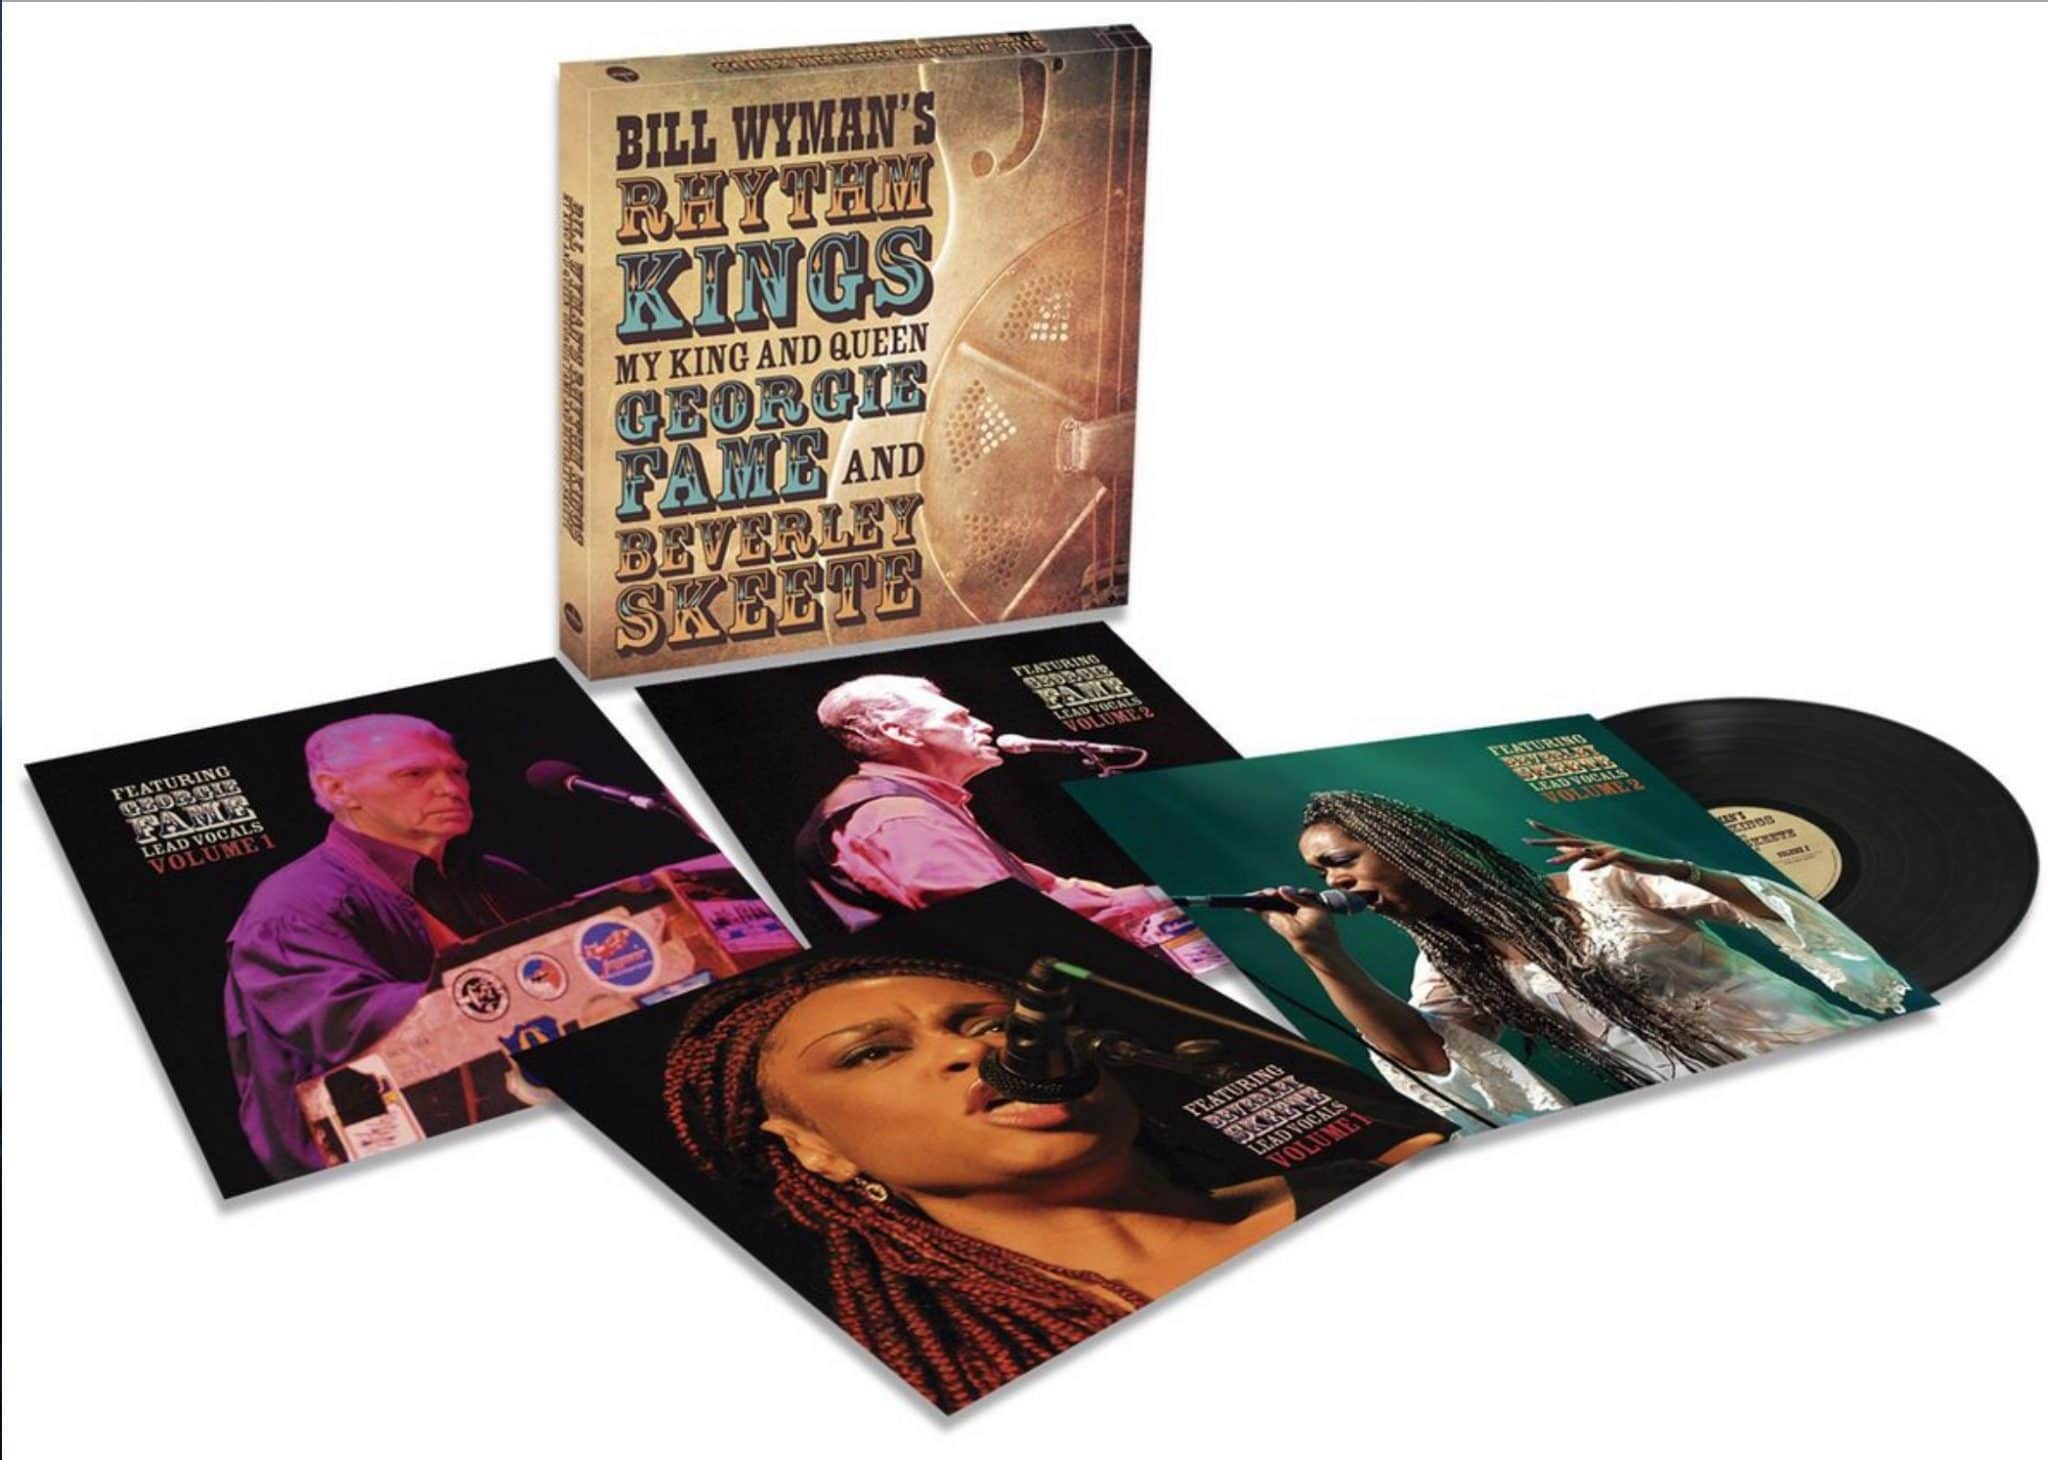 Demon Vinyl: New Wax from the venerable company